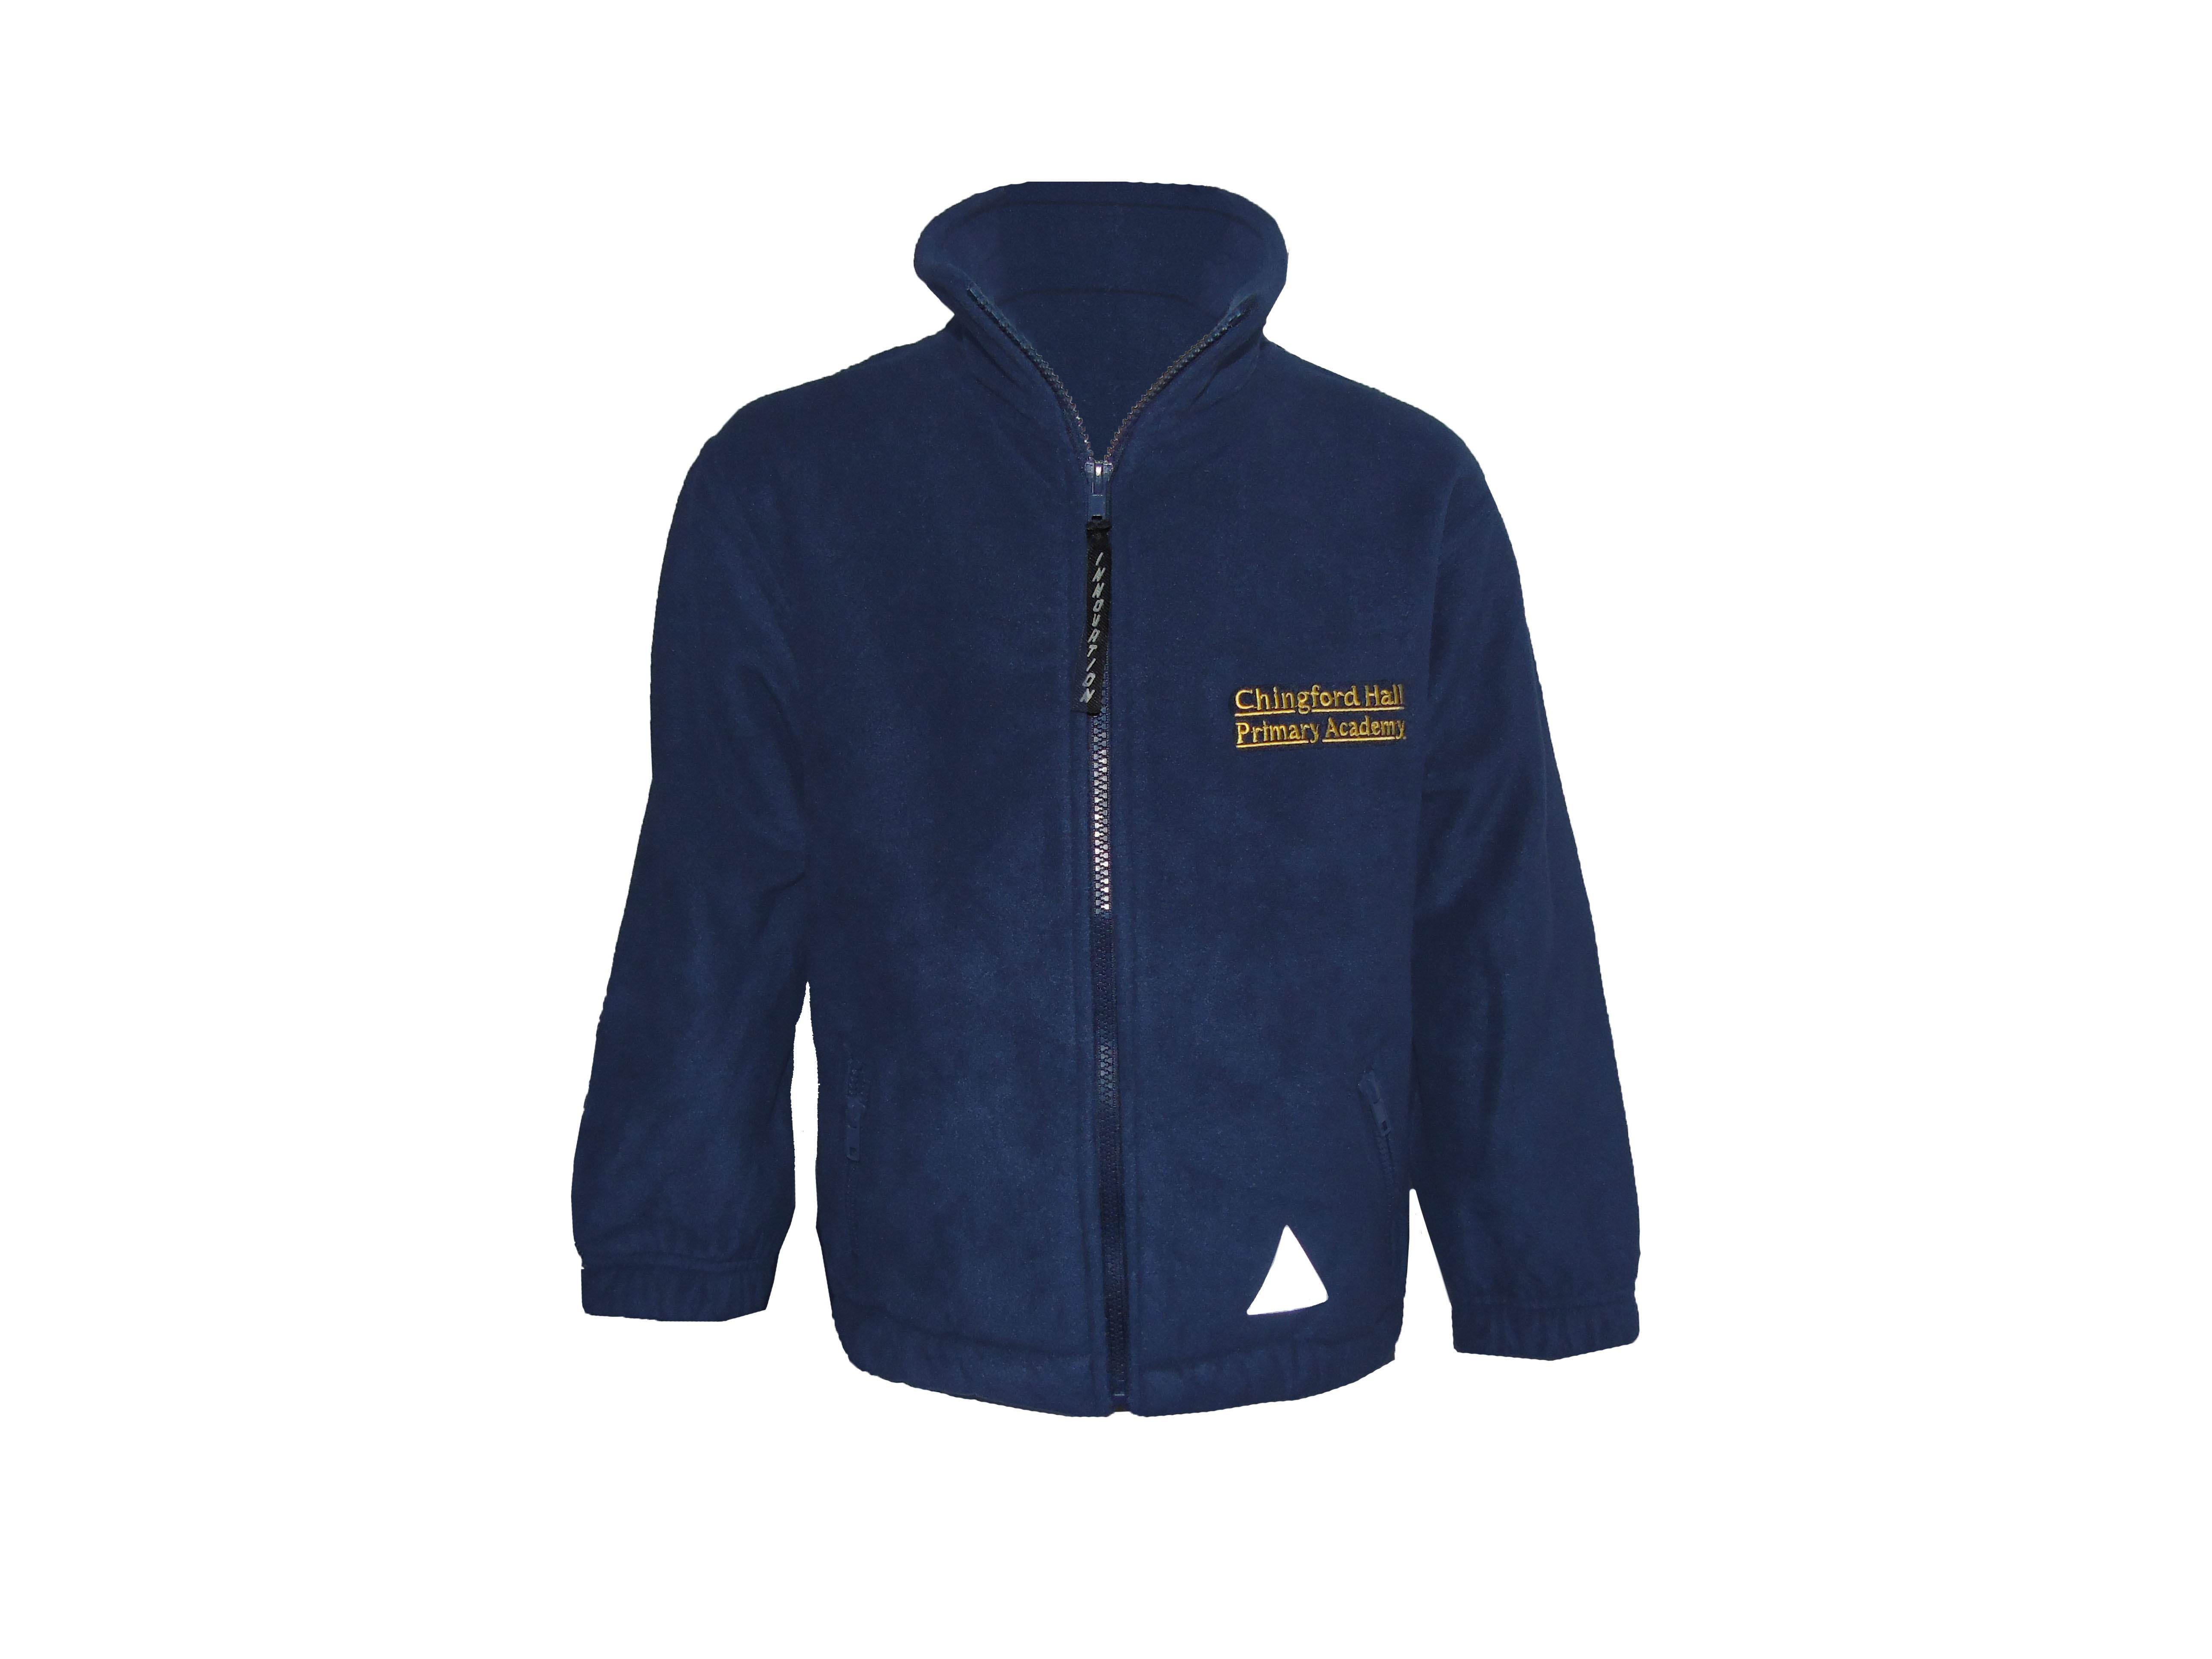 Chingford Hall Fleece Jacket